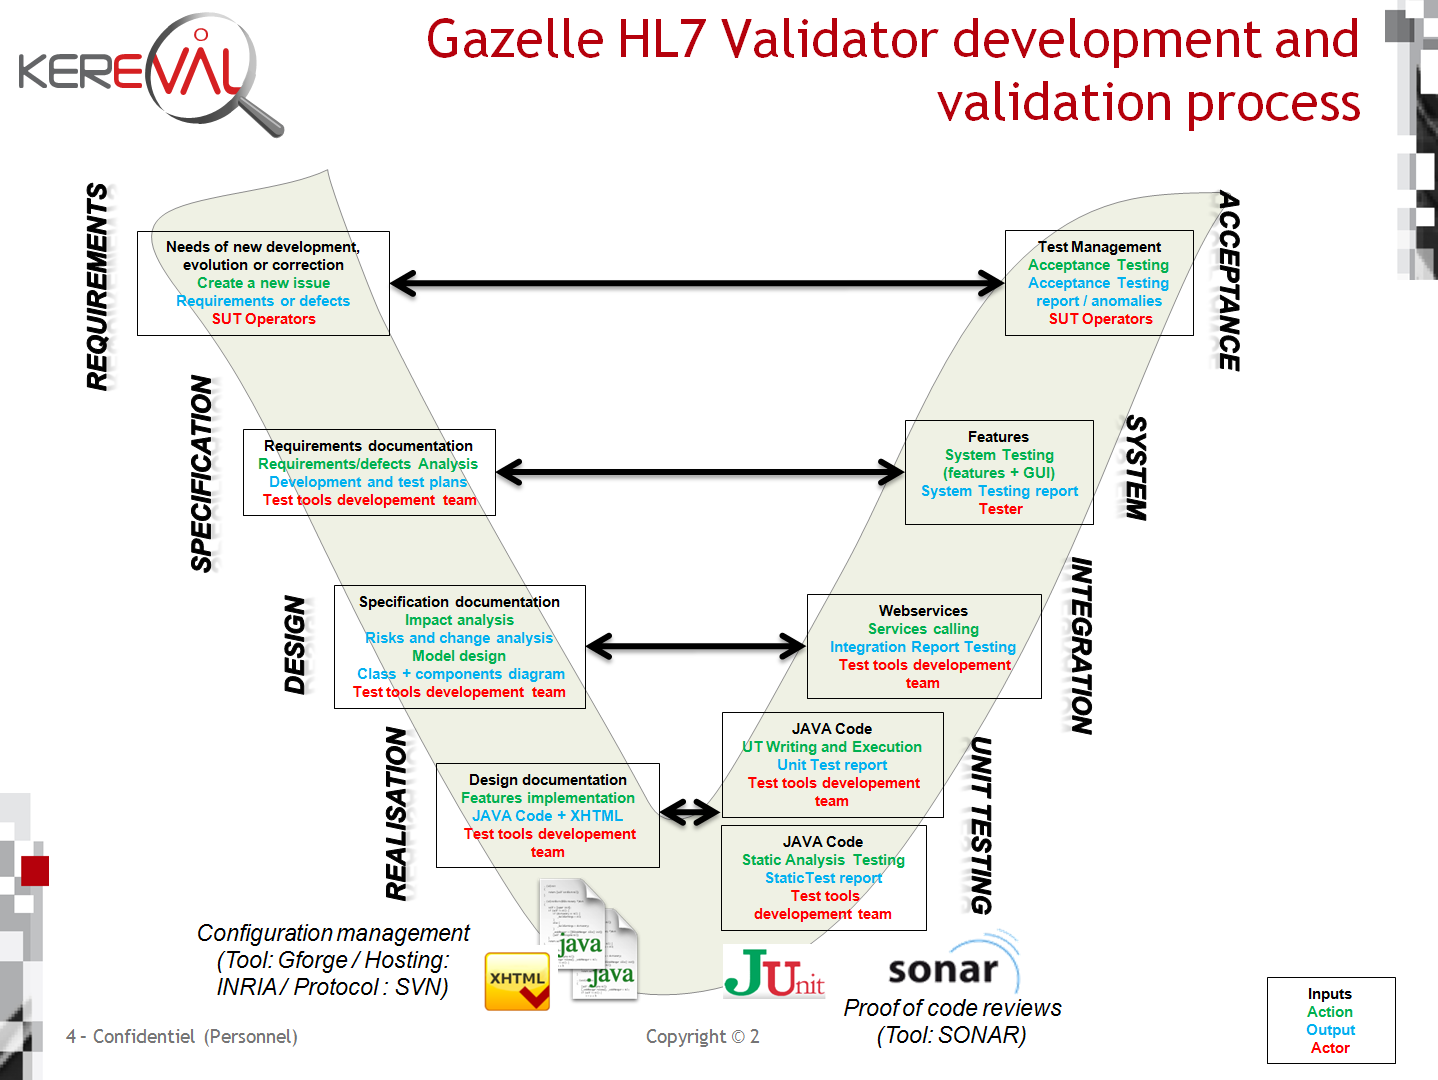 Gazelle HL Validator Development And Validation Process - Process documentation tools